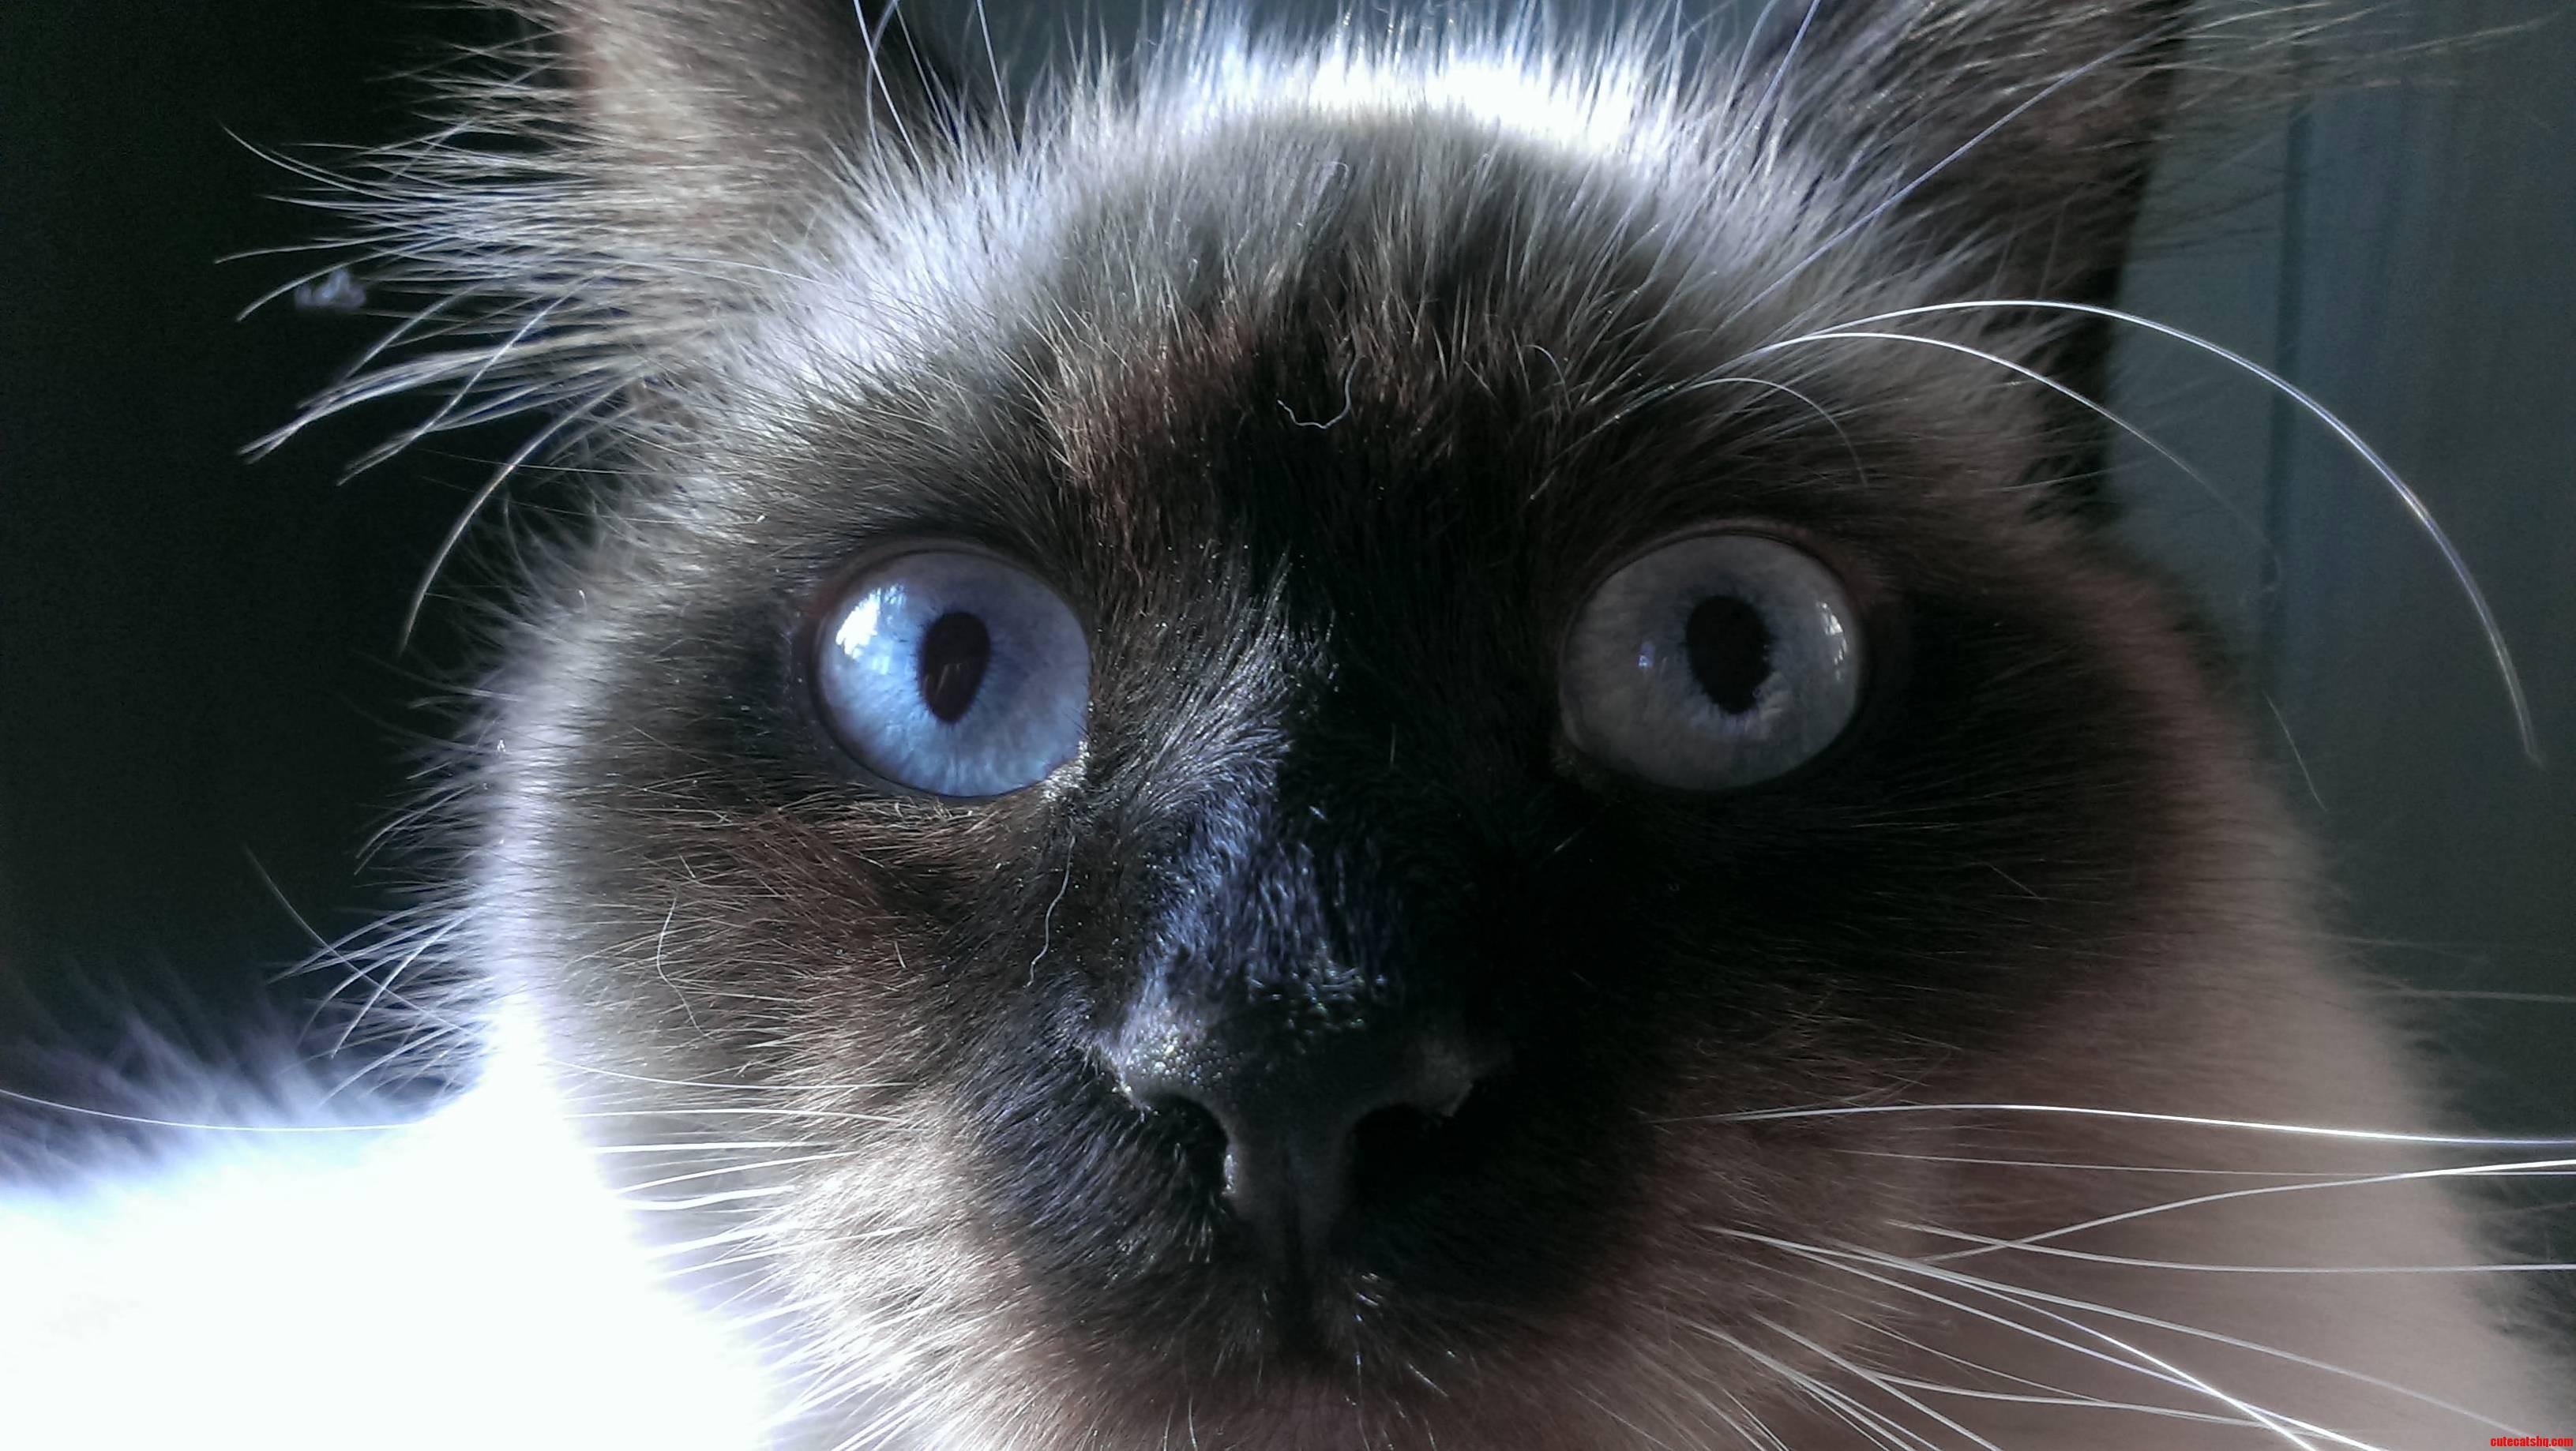 He always looks surprised